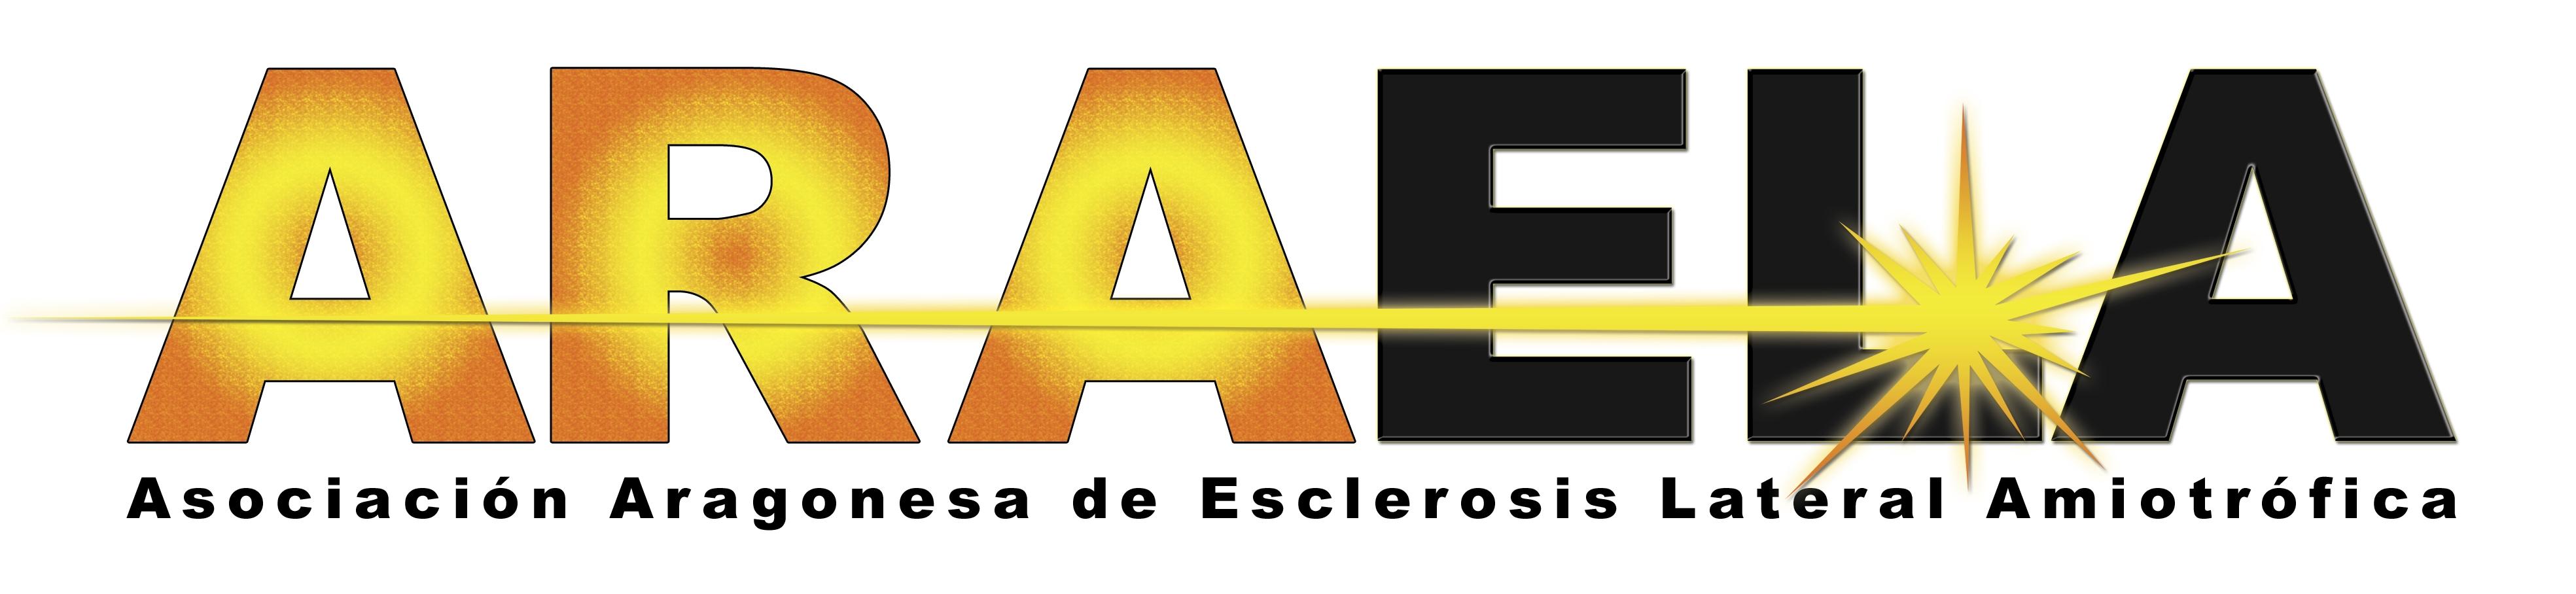 Araela - Asociación Aragonesa de Esclerosis Lateral Amiotrófica